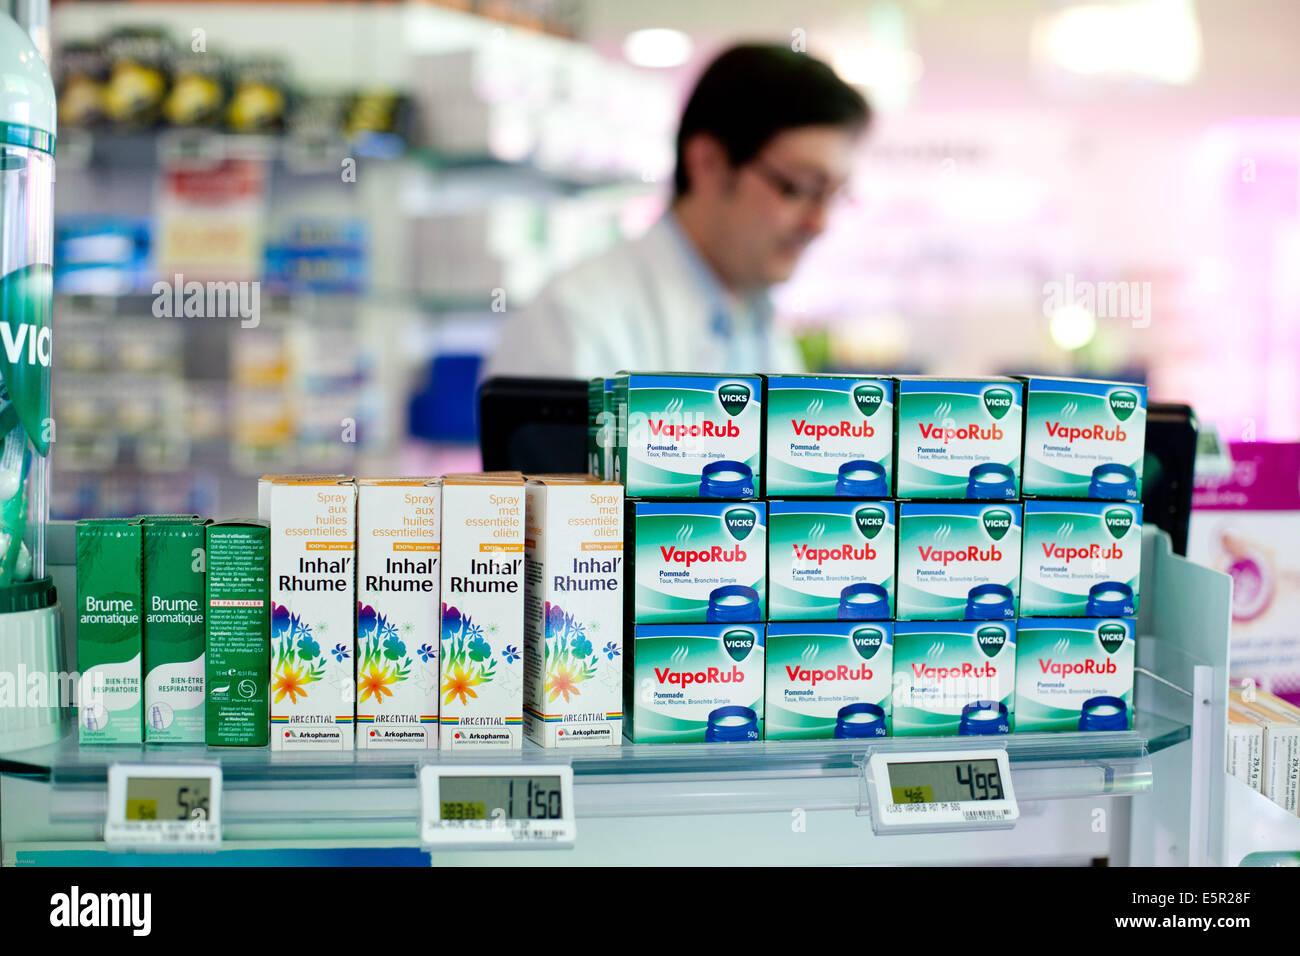 Médicaments vendus en libre-accès en pharmacie Over-the-counter medicine sold in pharmacy. - Stock Image